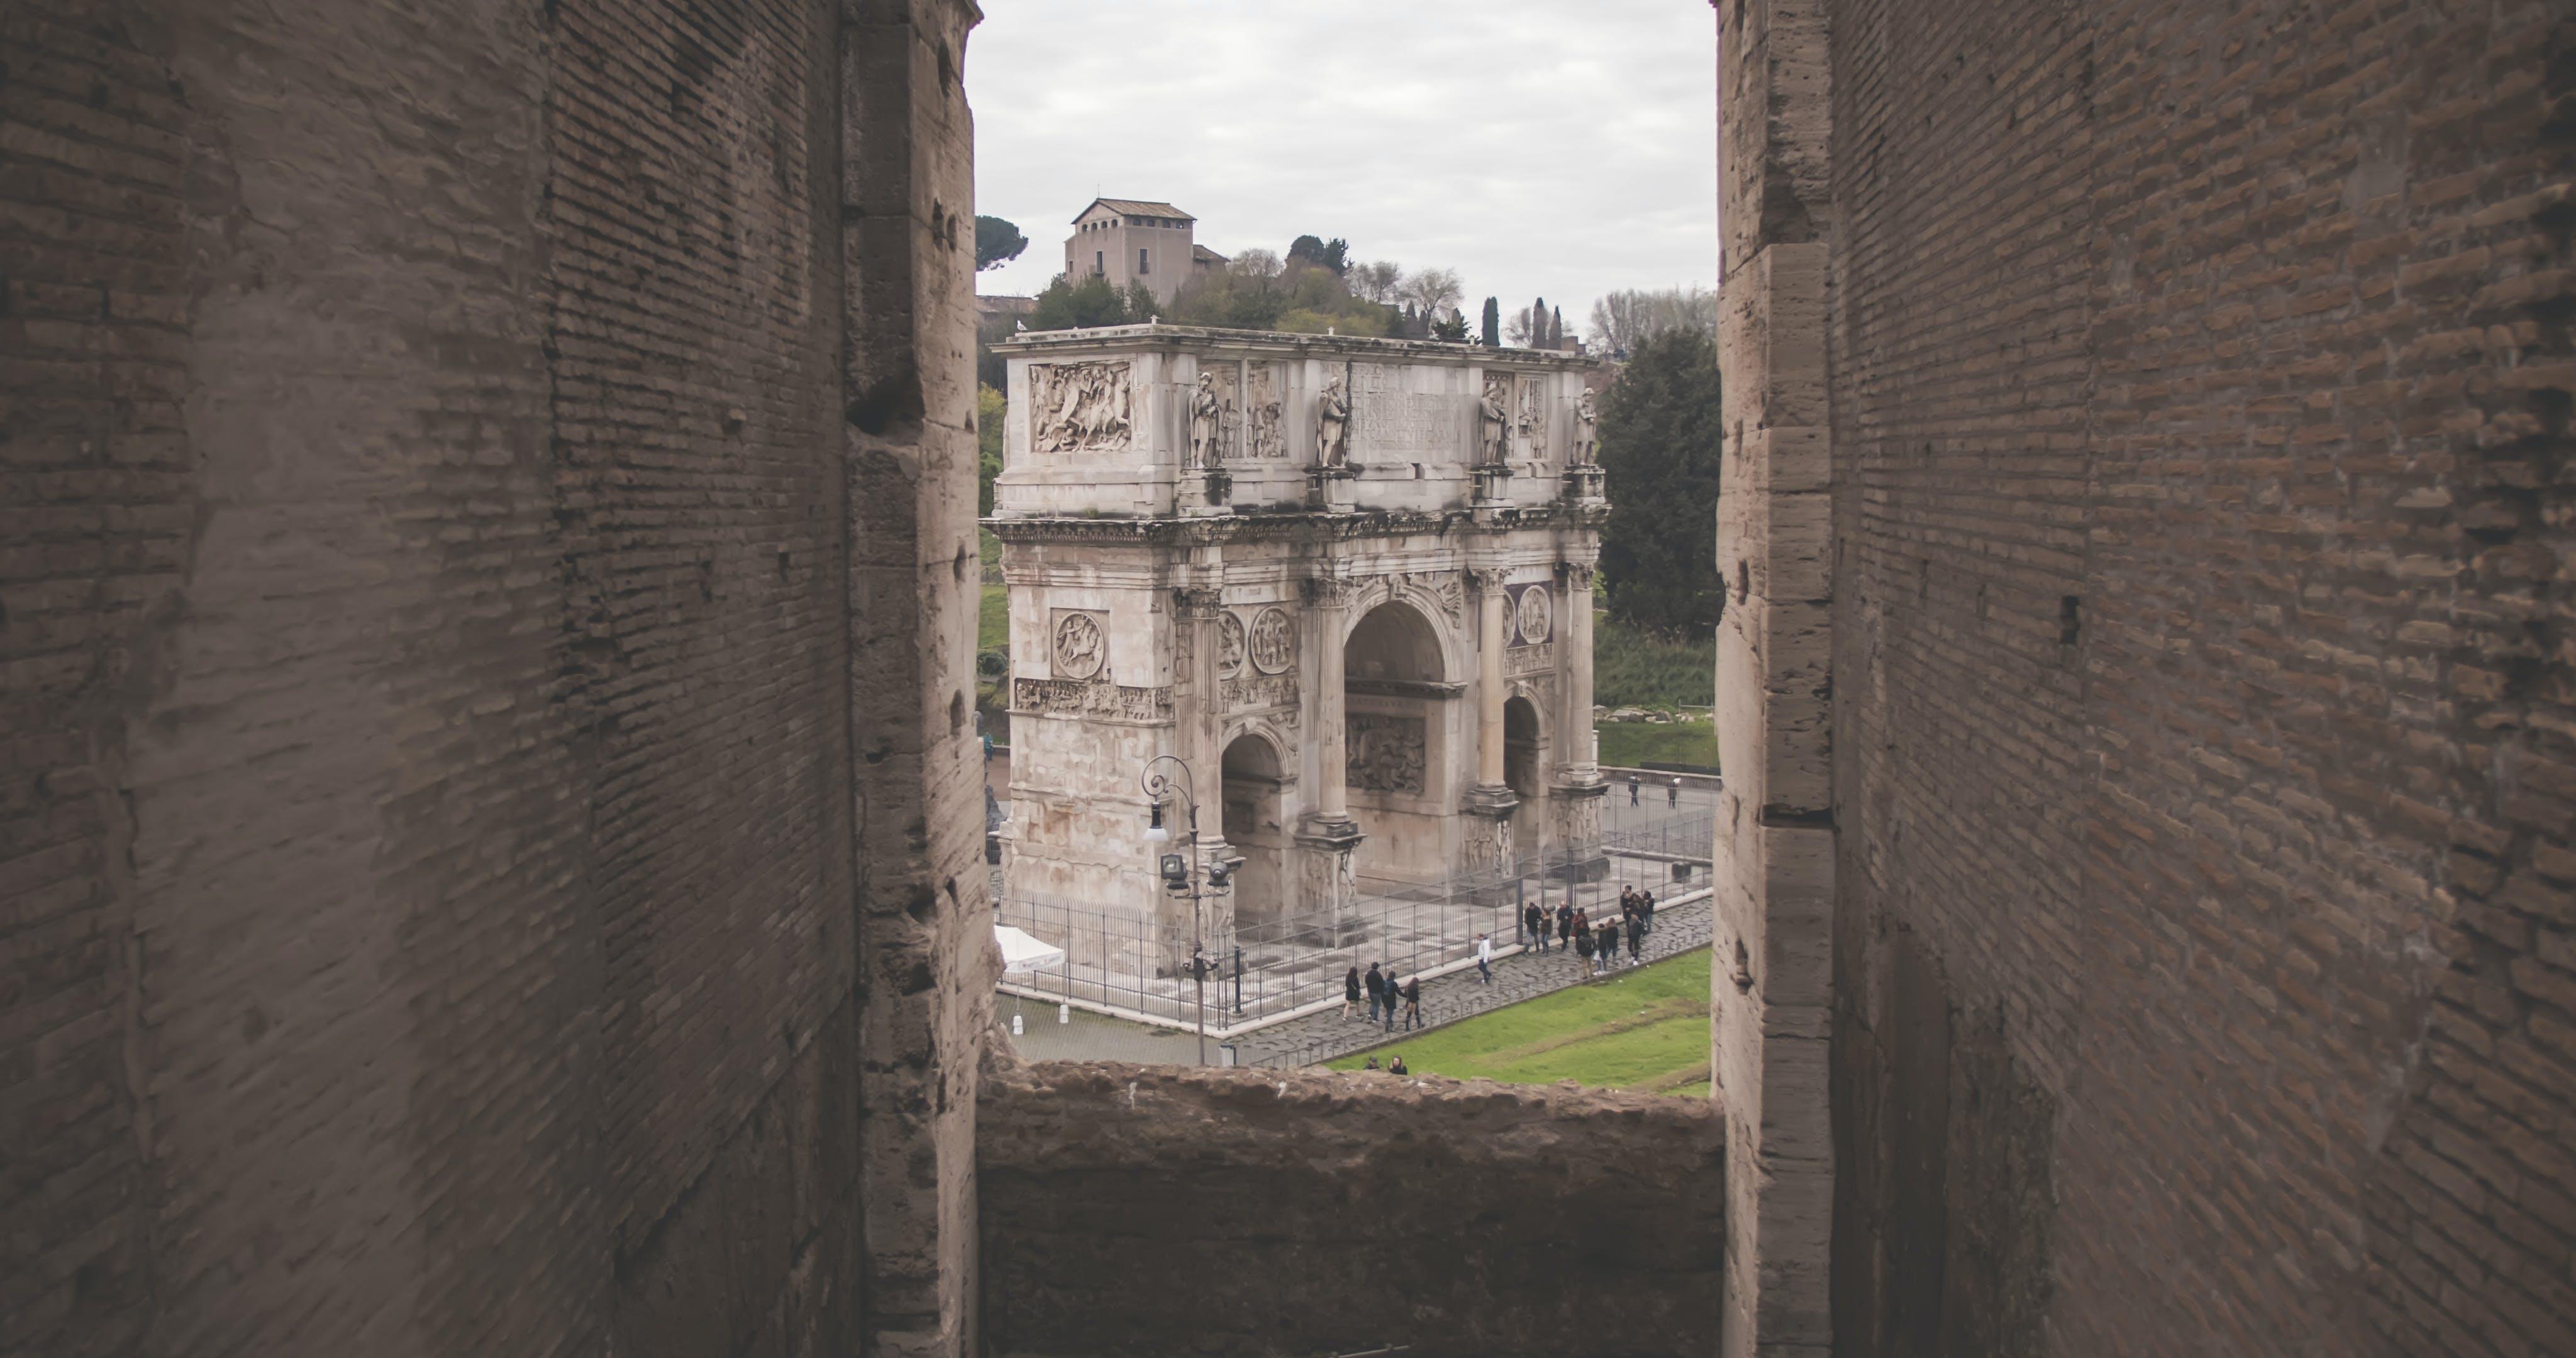 Fotos de stock gratuitas de antiguo, arco, arquitectura, castillo